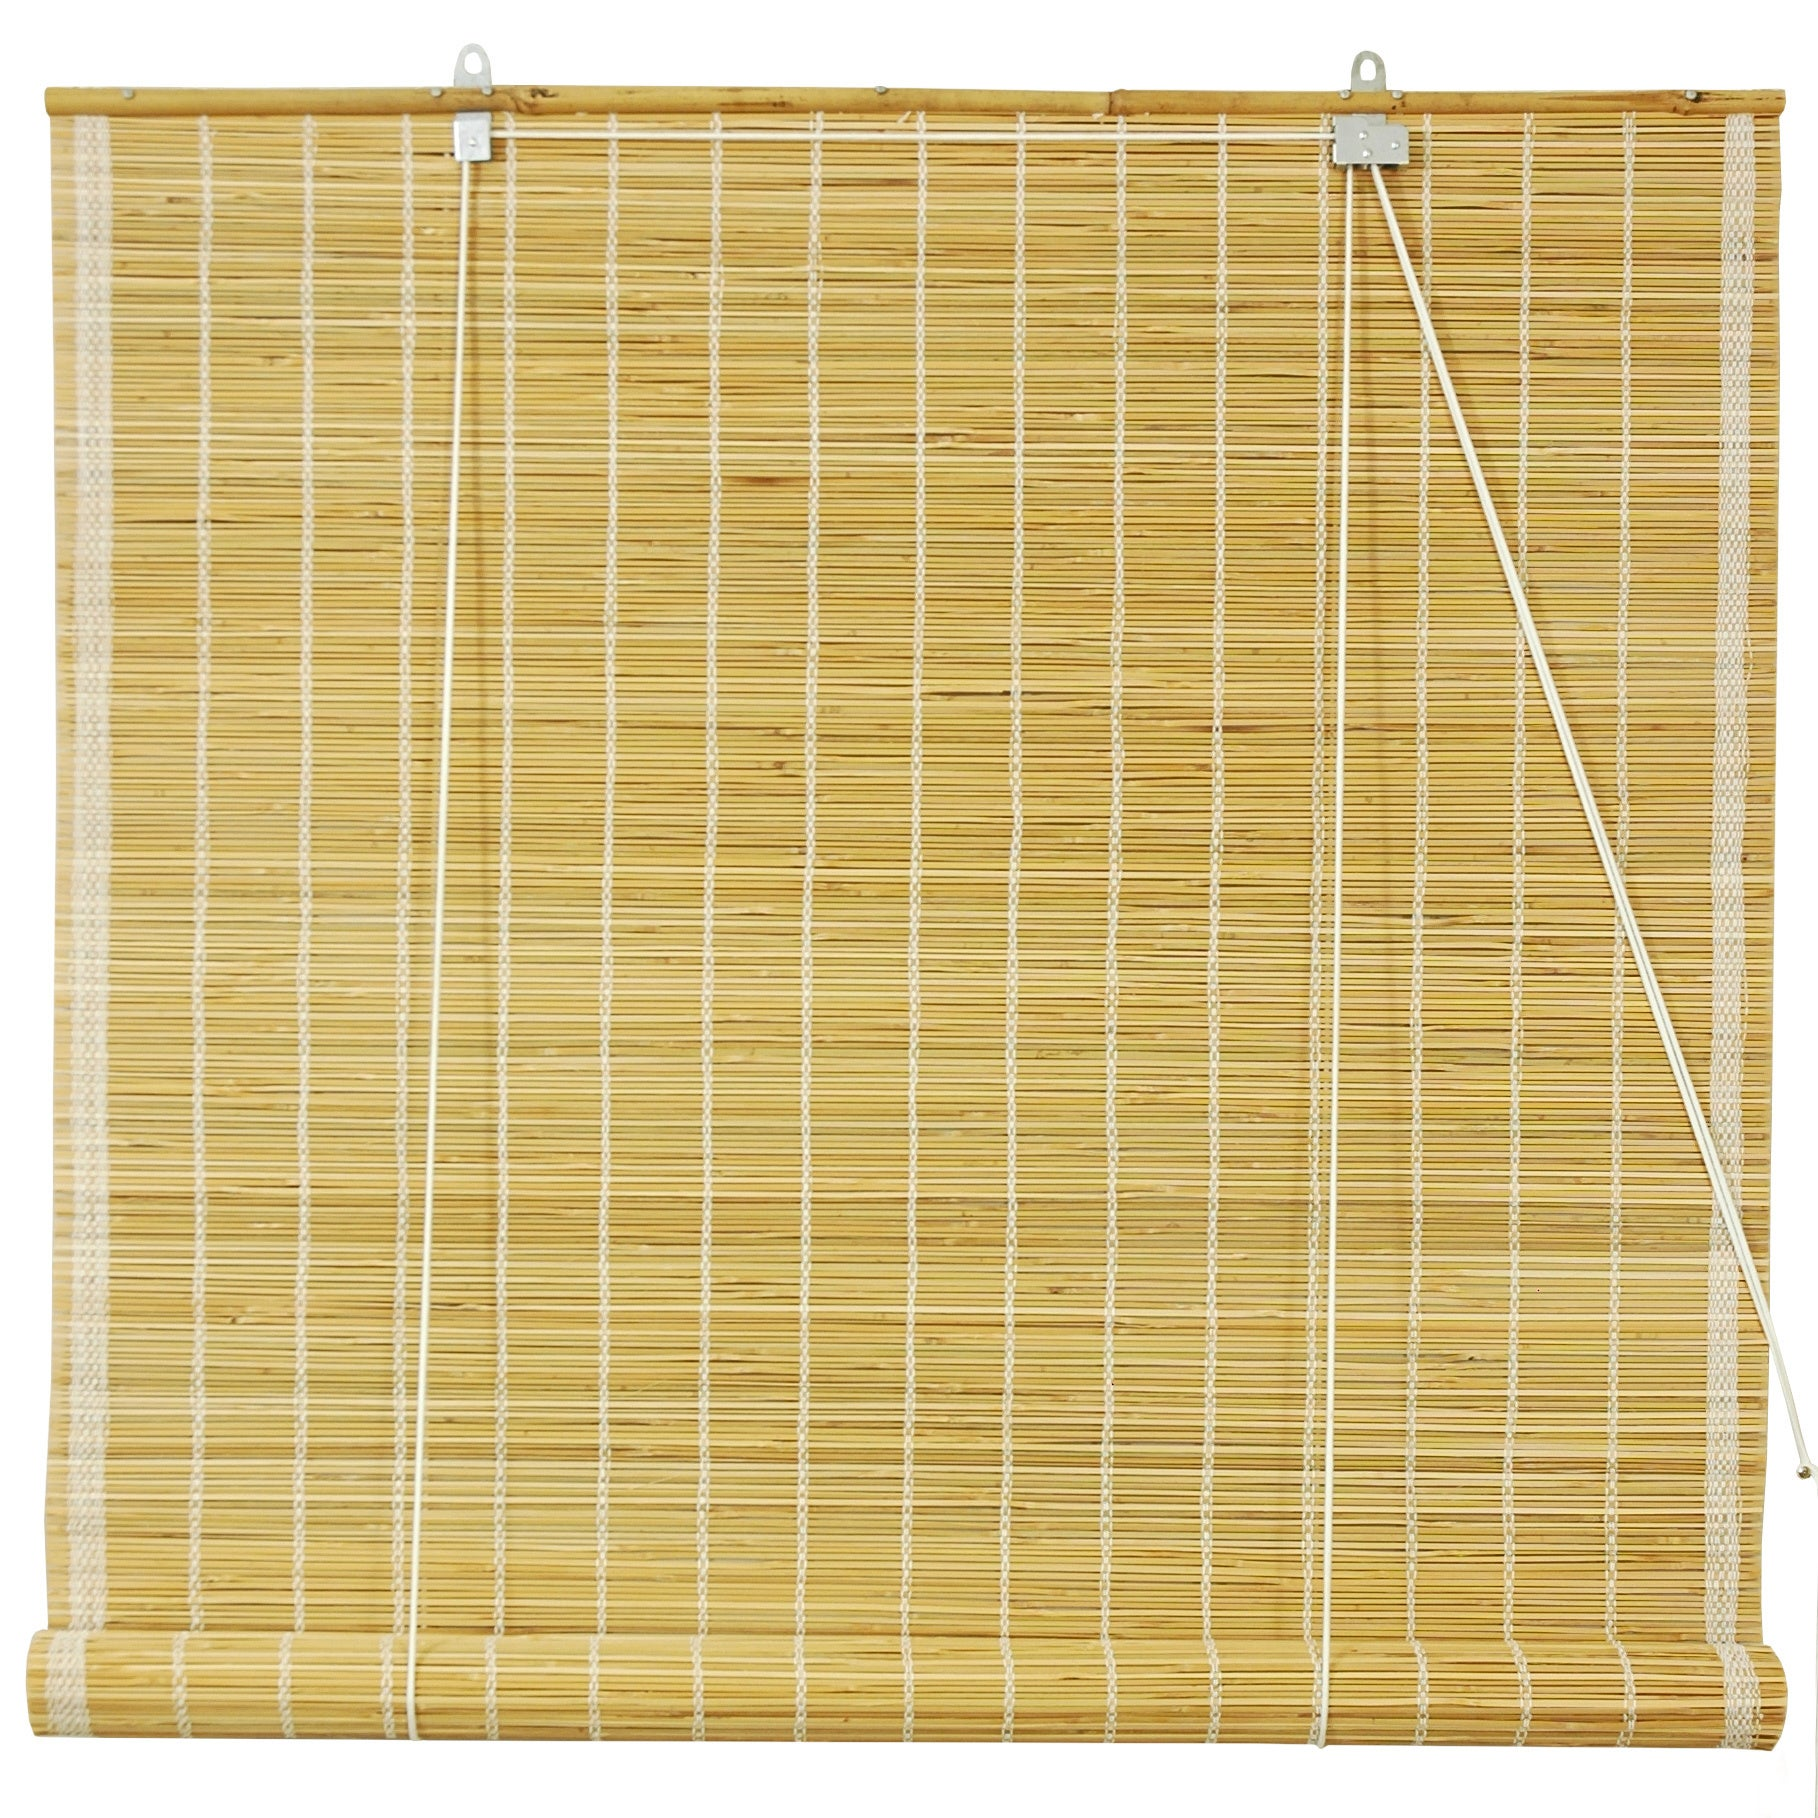 Oriental FURNITURE Handmade Matchstick Natural Roll-up Wi...